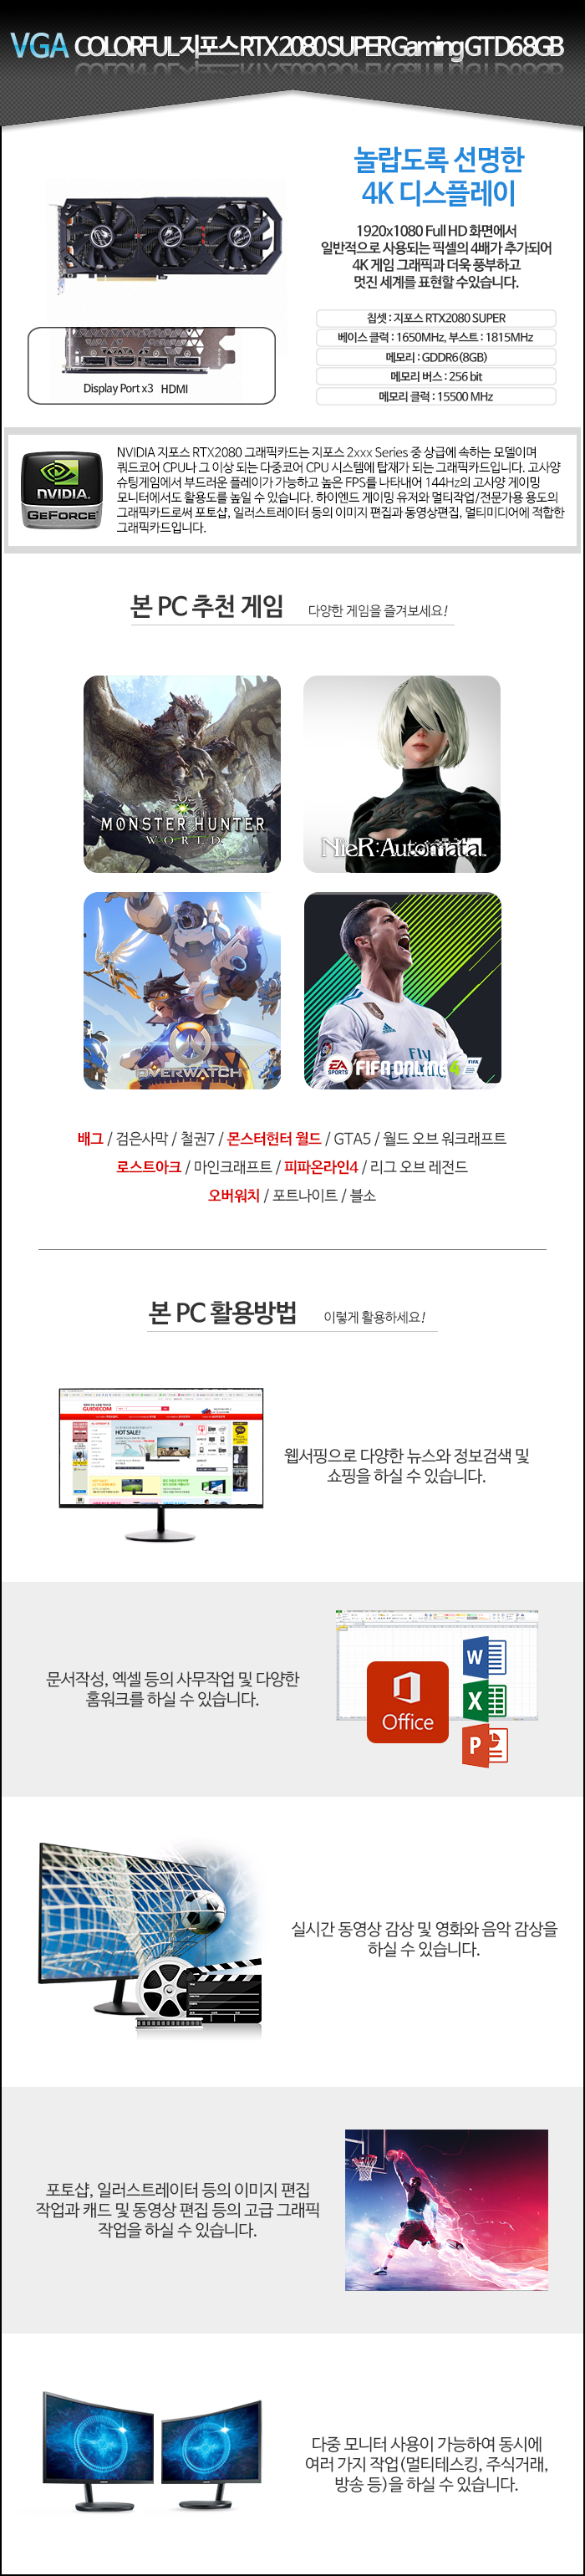 [COLORFUL] 지포스 RTX 2080 SUPER Gaming GT D6 8GB